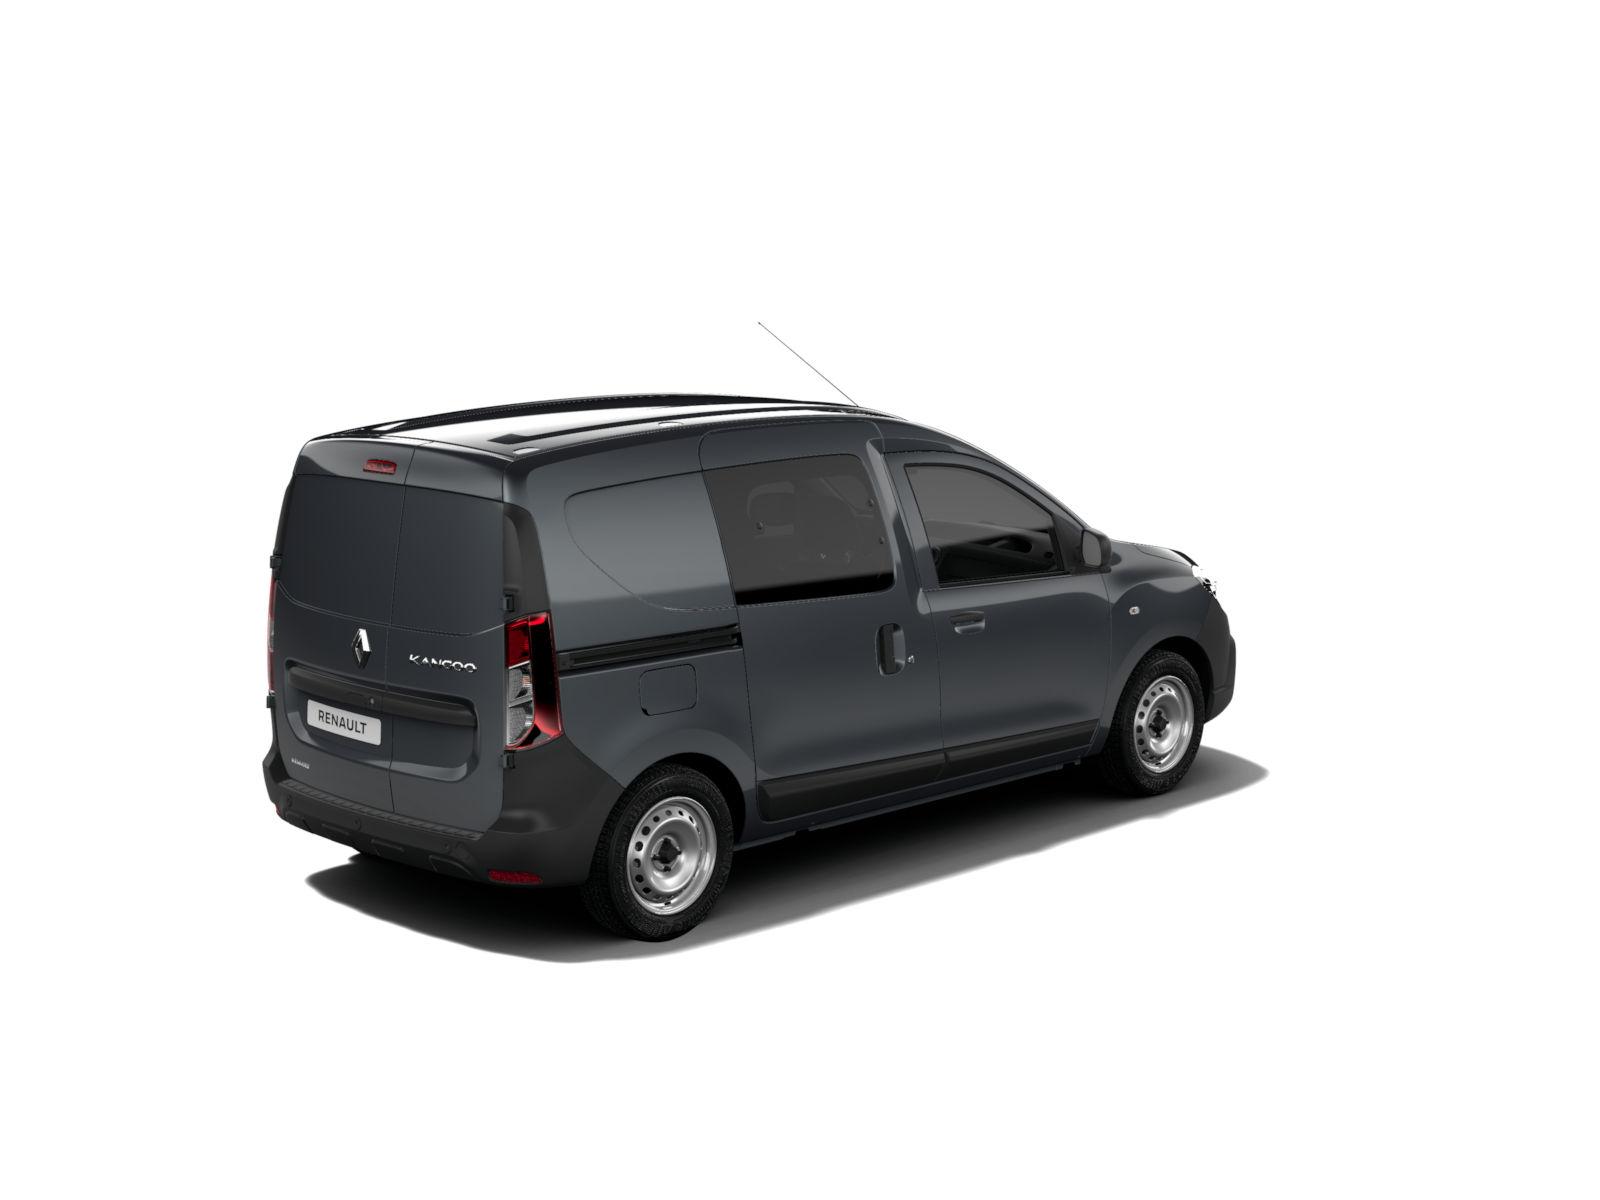 nouveau renault kangoo express 1 the automobilist. Black Bedroom Furniture Sets. Home Design Ideas